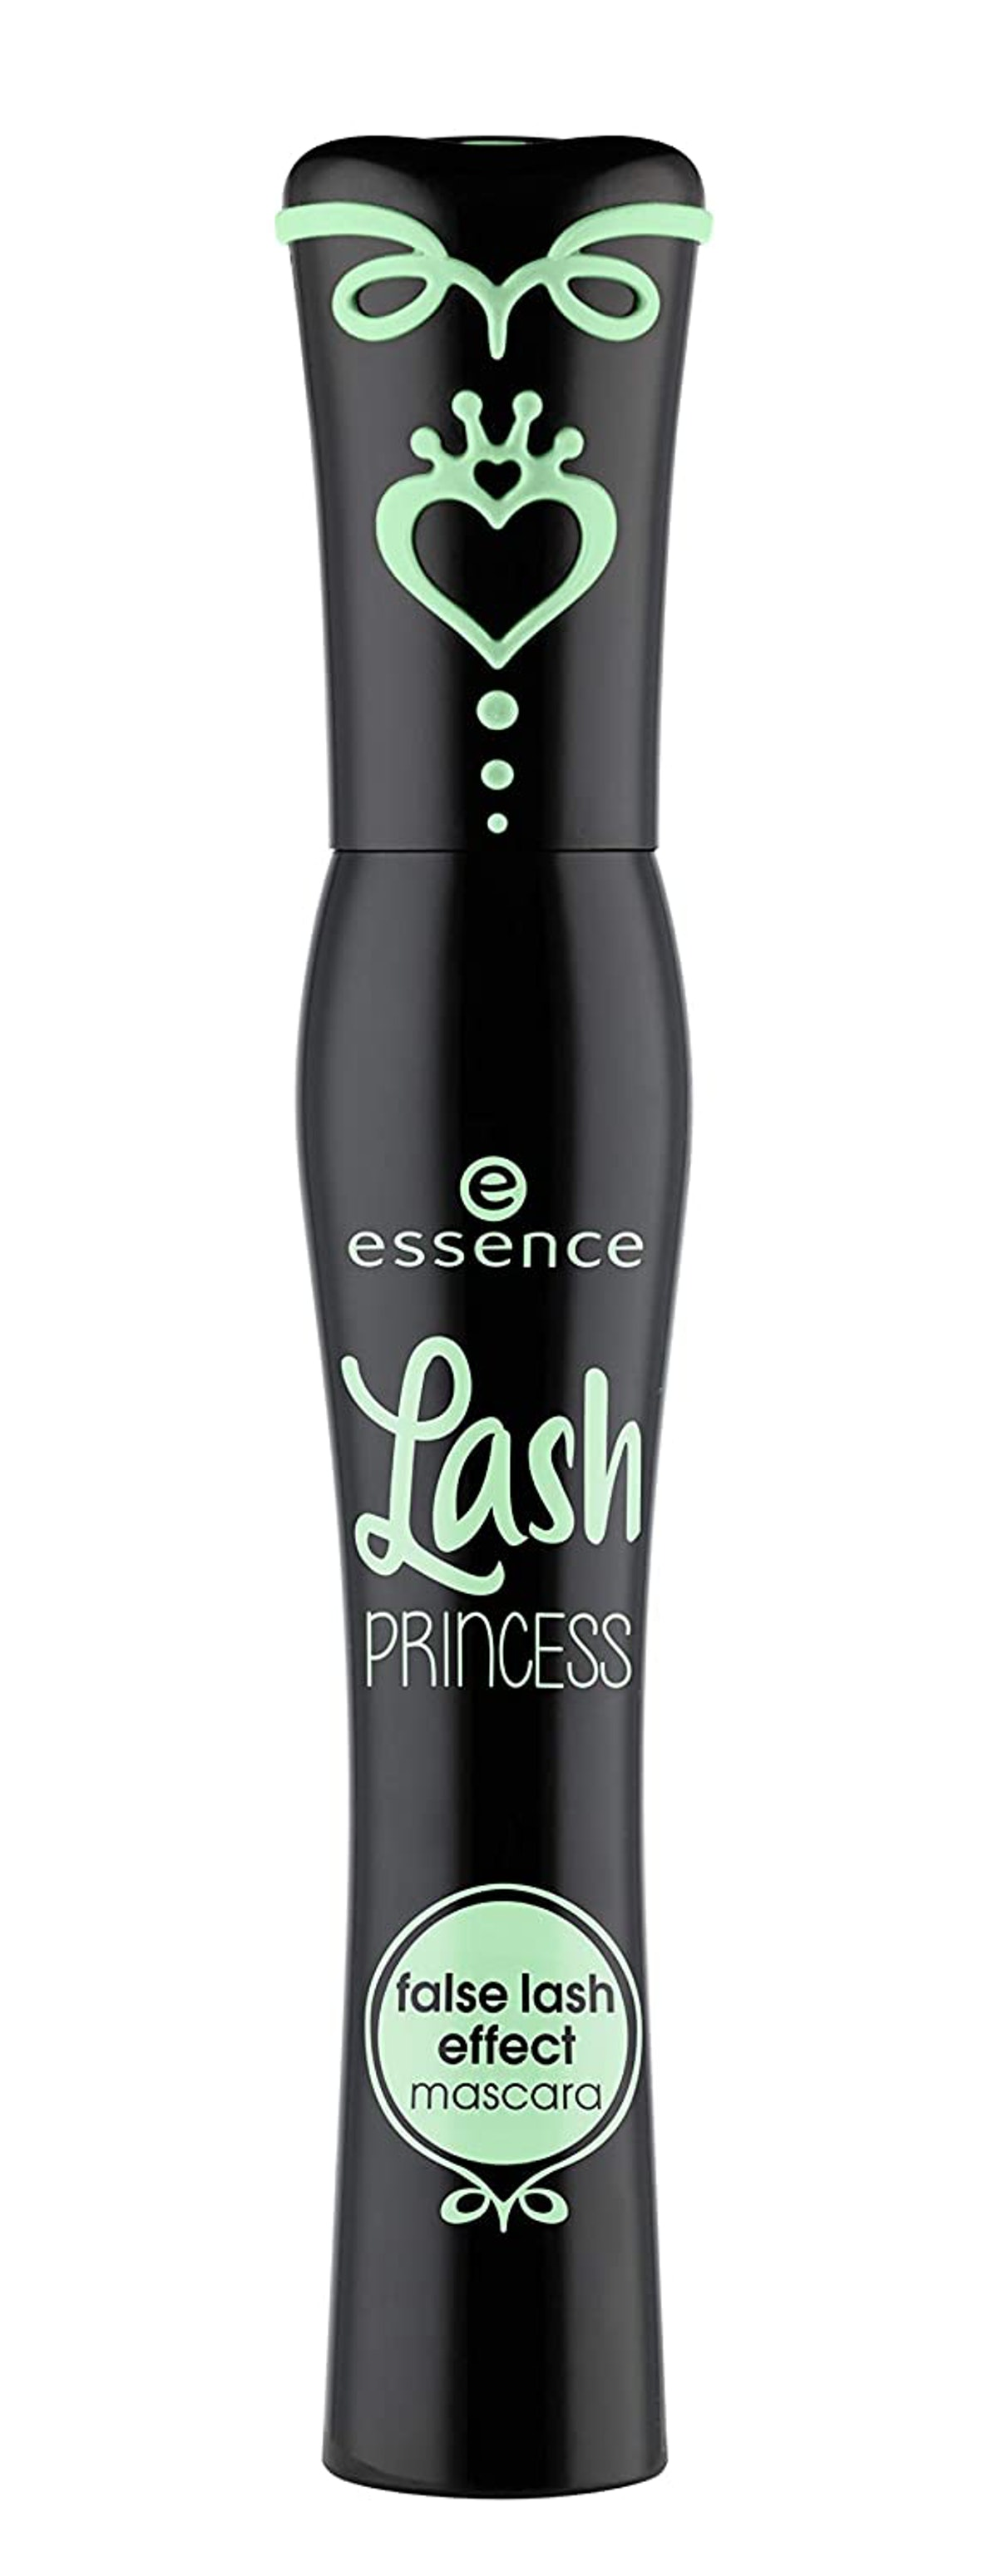 essence Lash Princess False Lash Effect Mascara